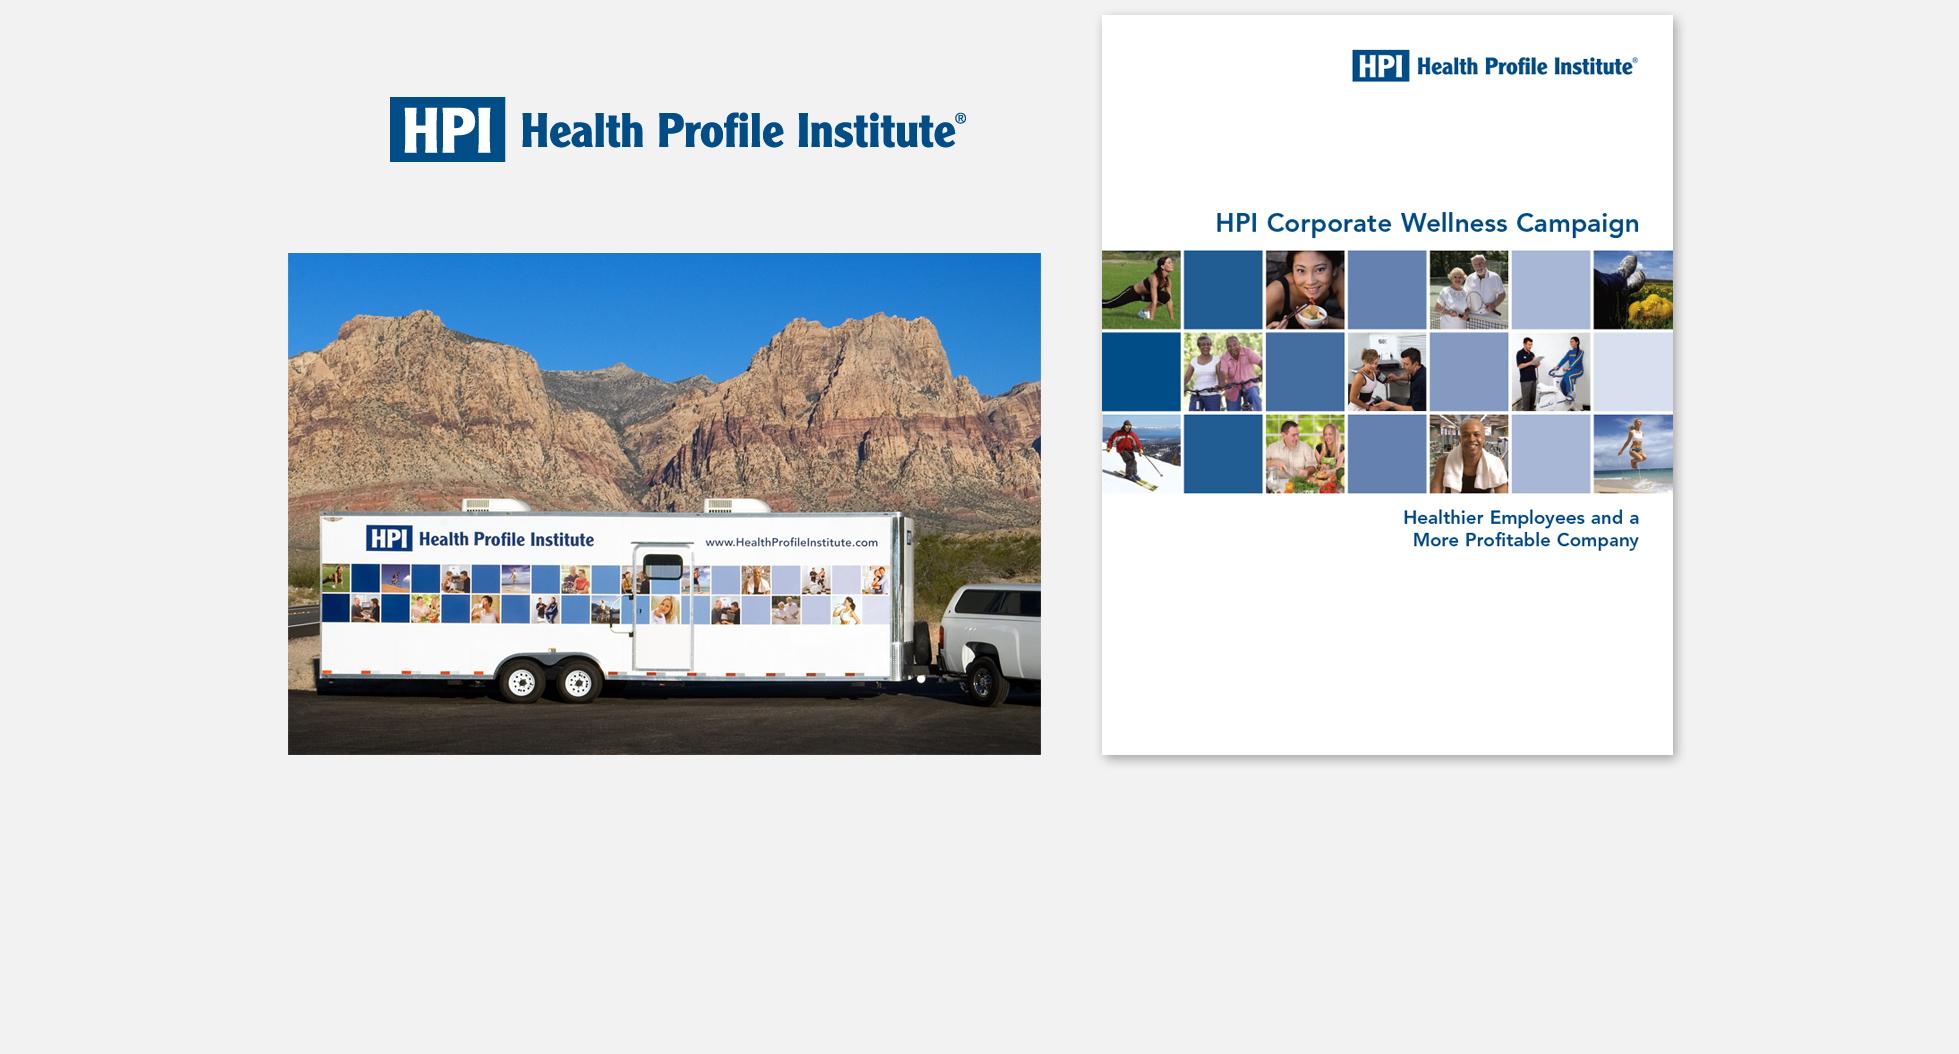 Health Profile Institute